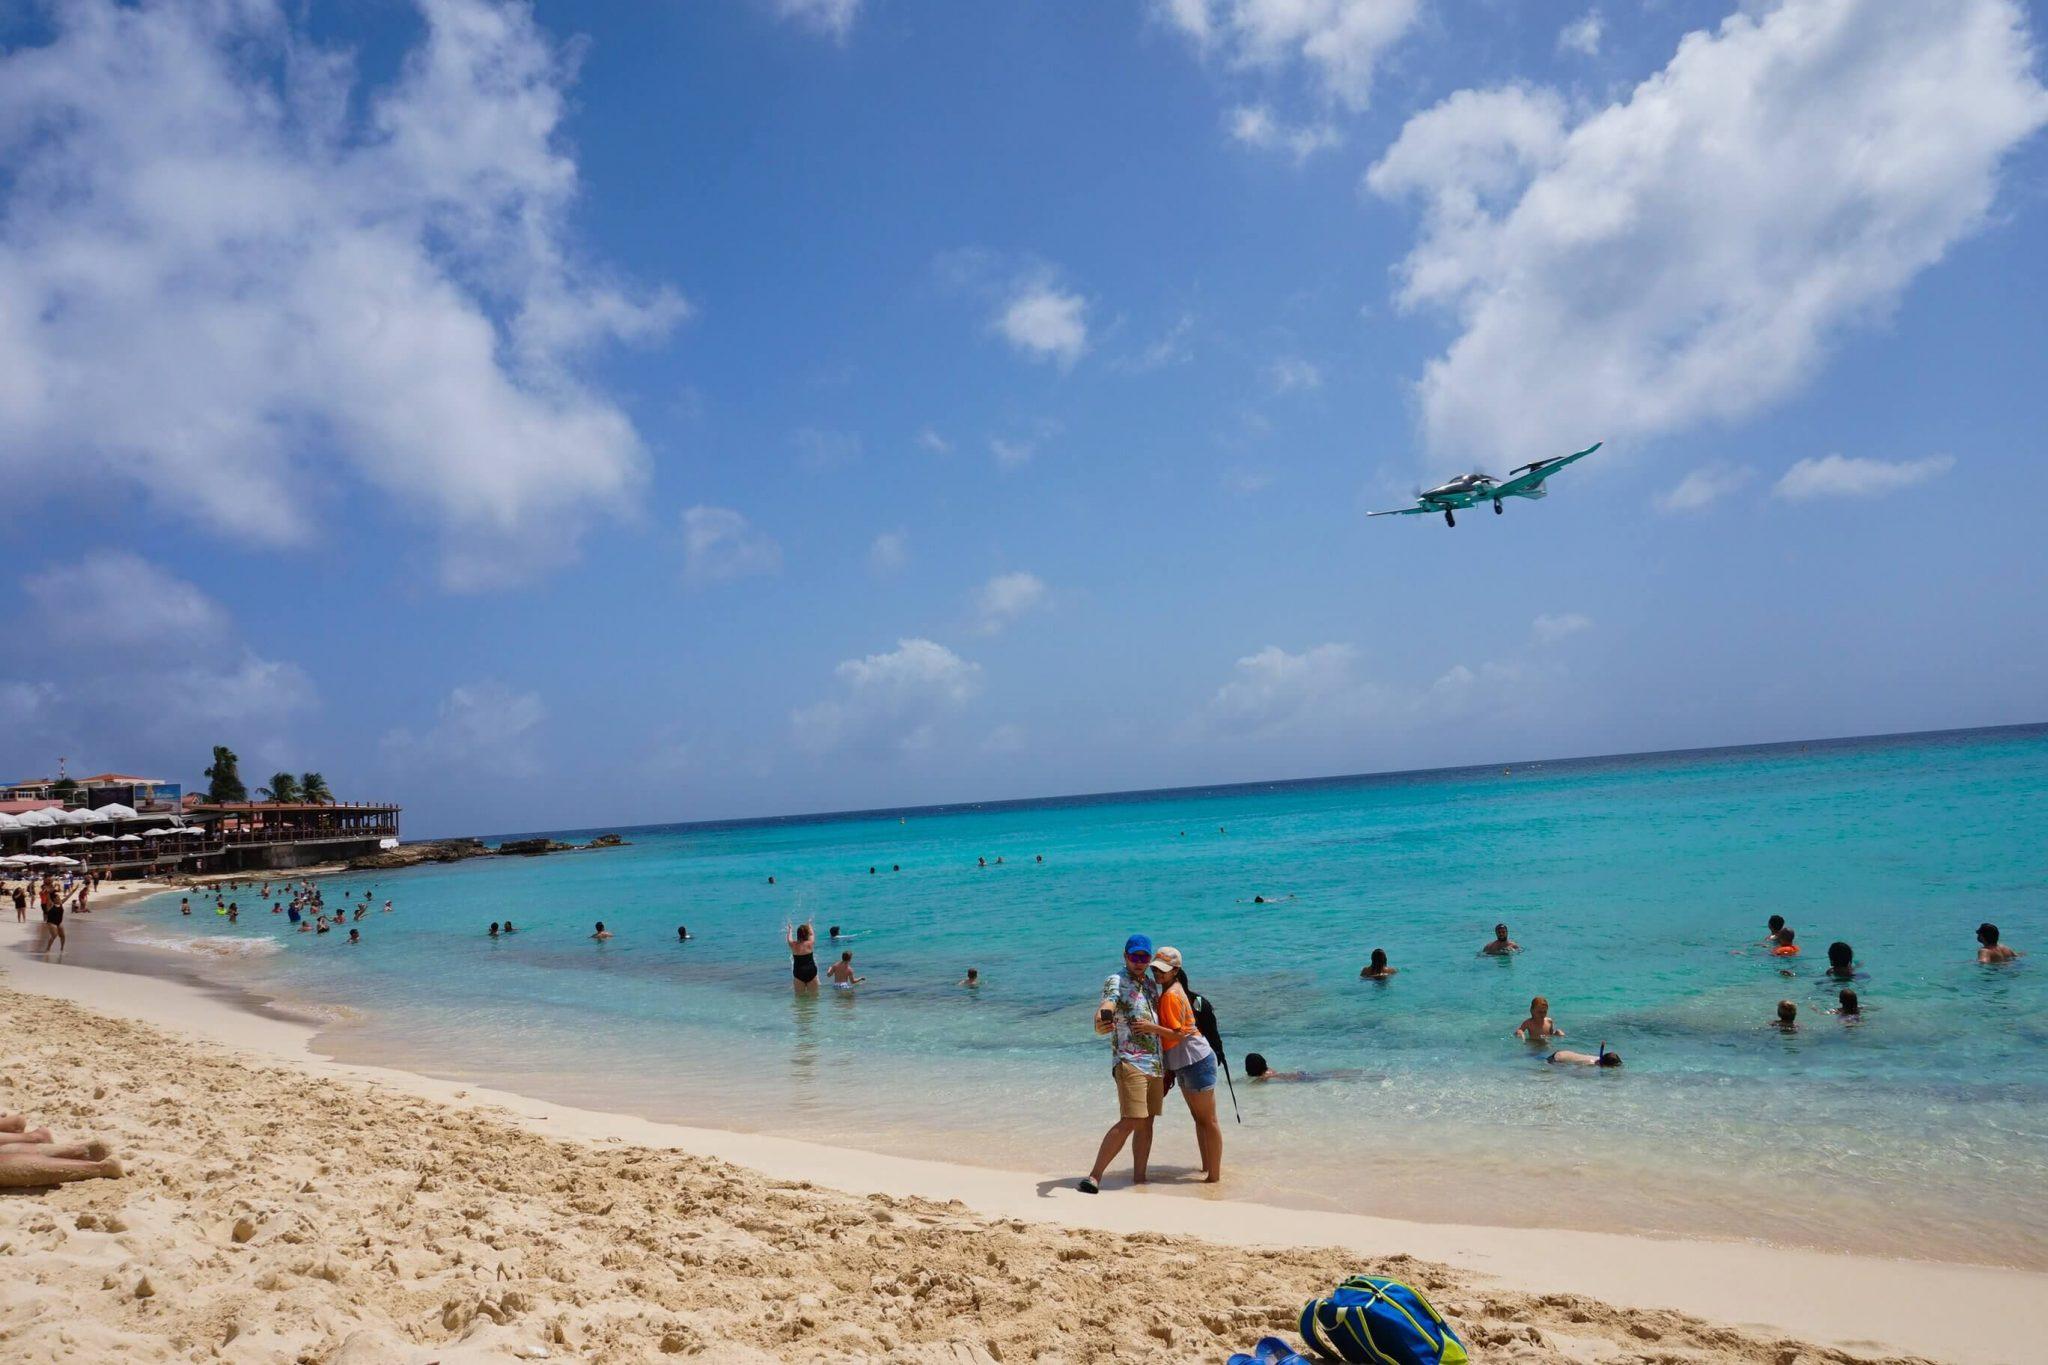 Nomad-Cruise-St-Maarten-Plane